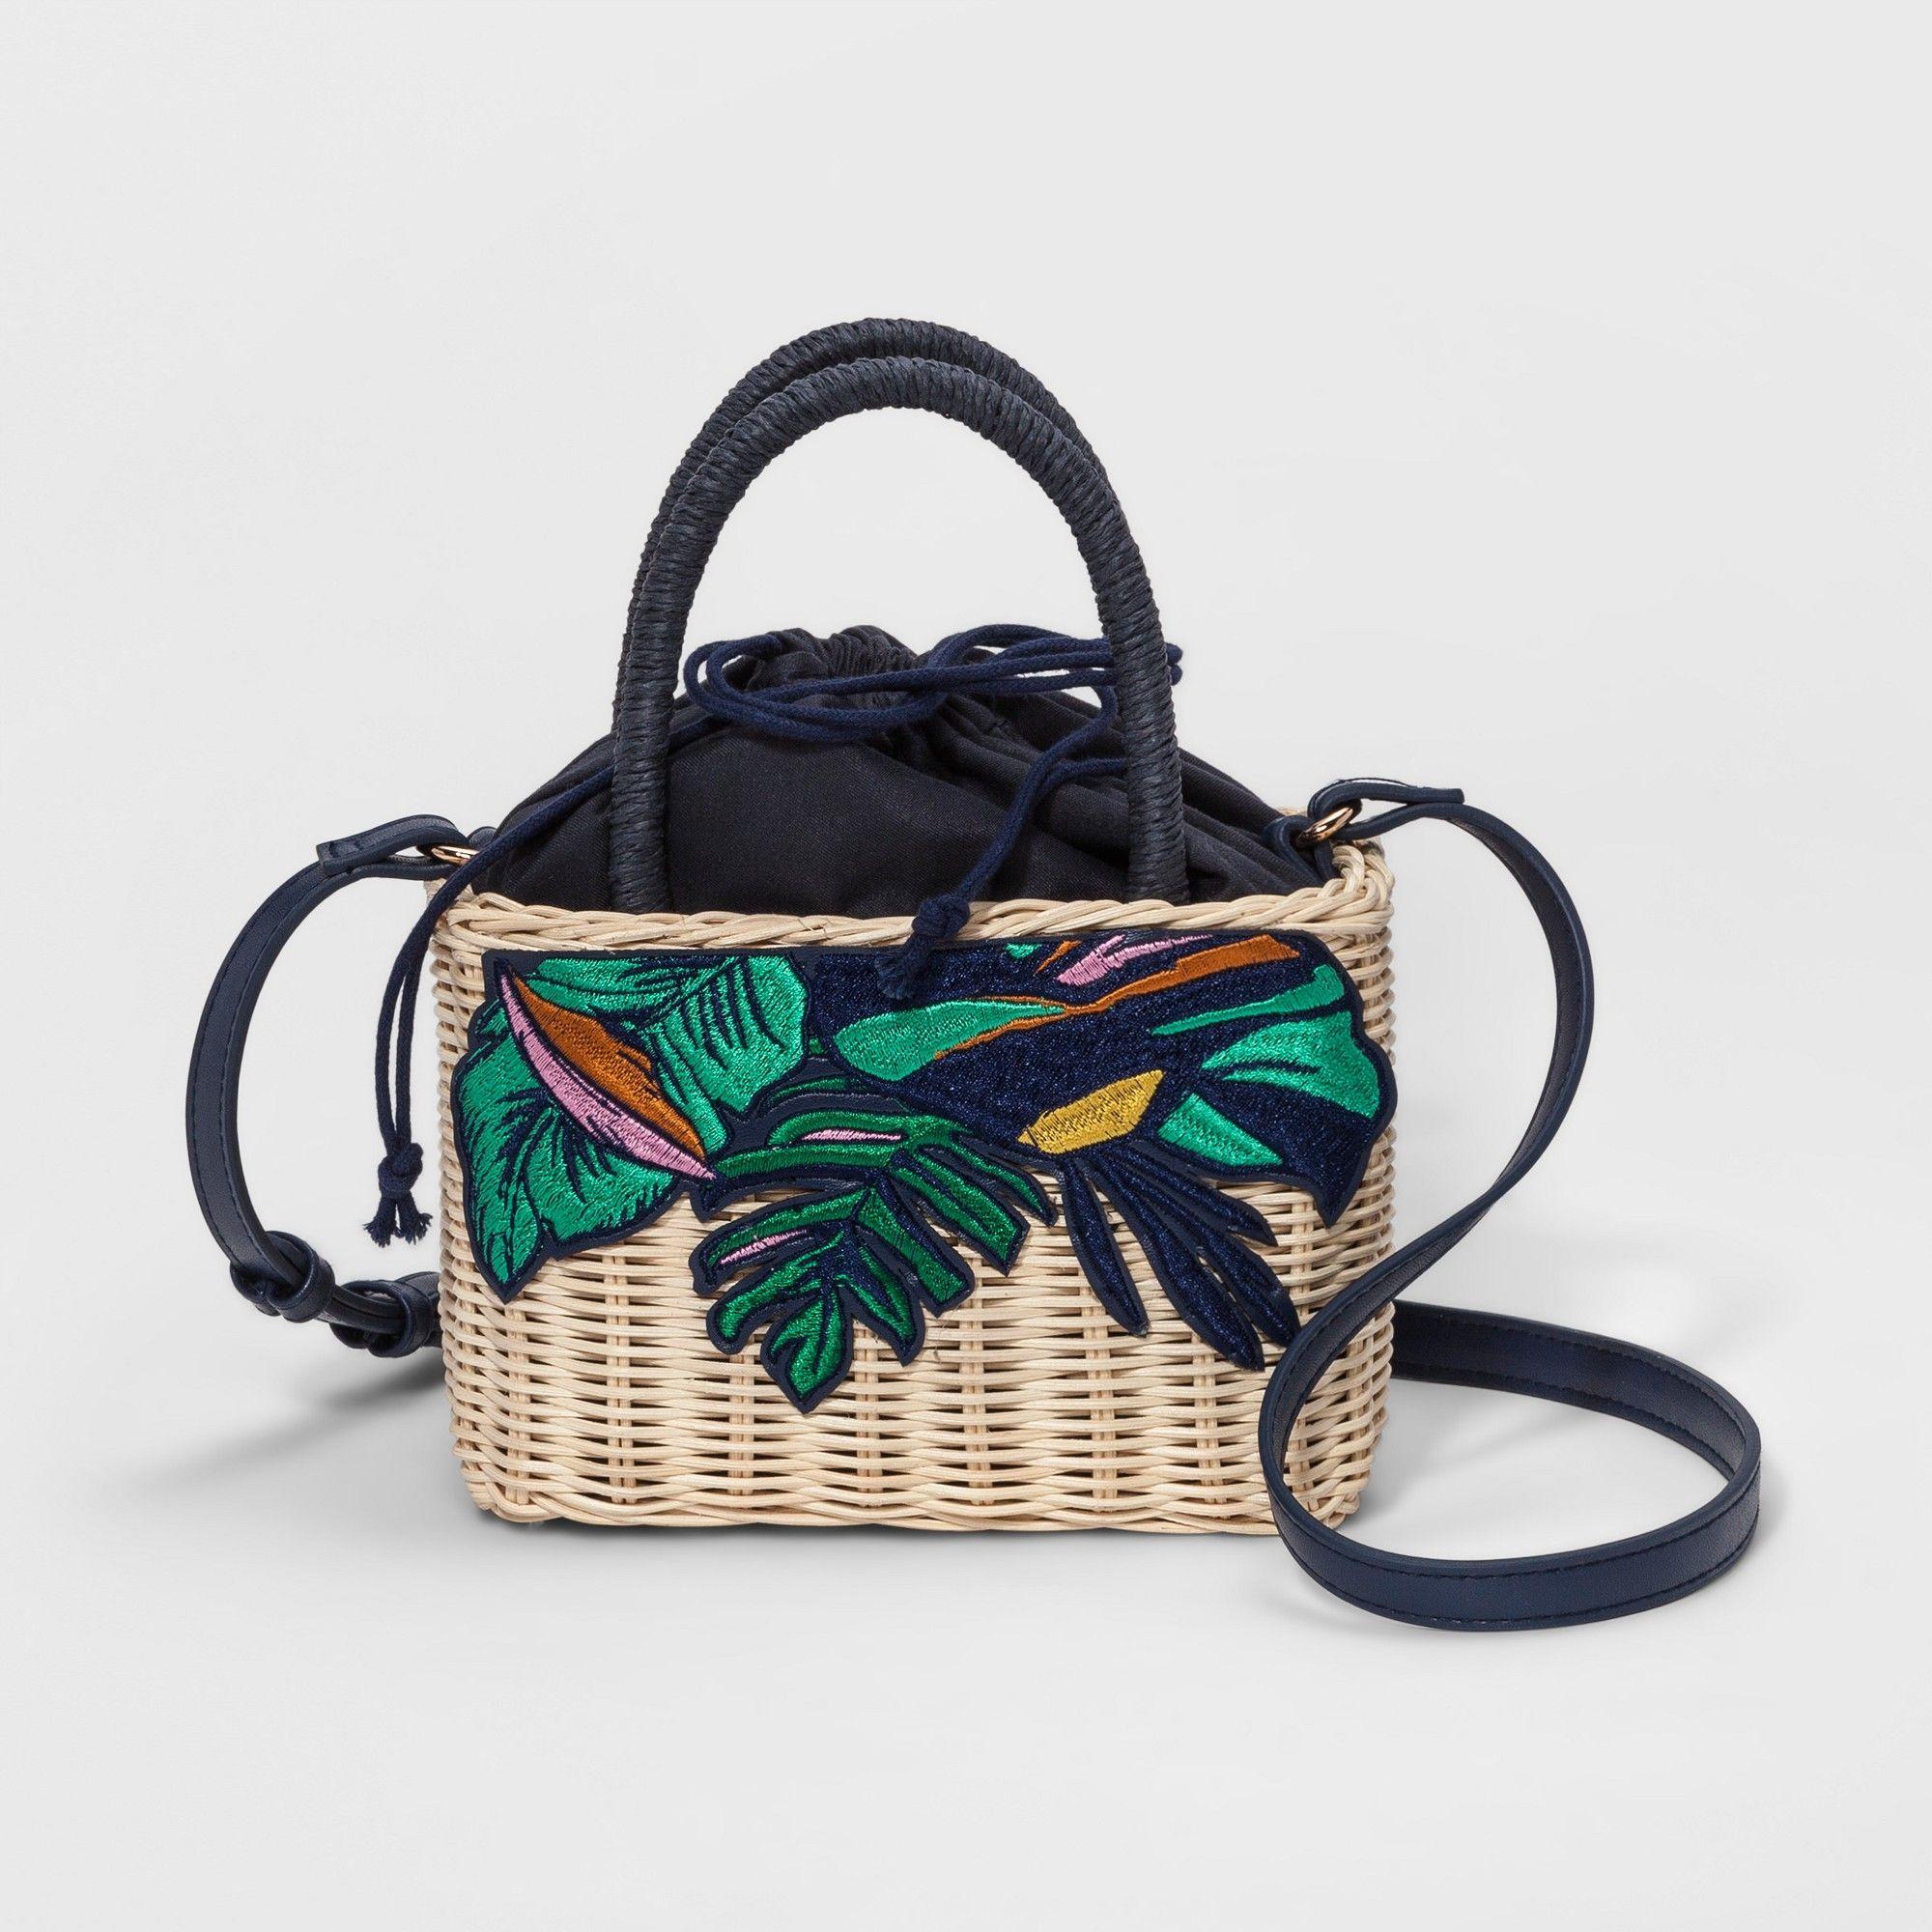 8a1138d045 Basket Crossbody Bag - A New Day Natural